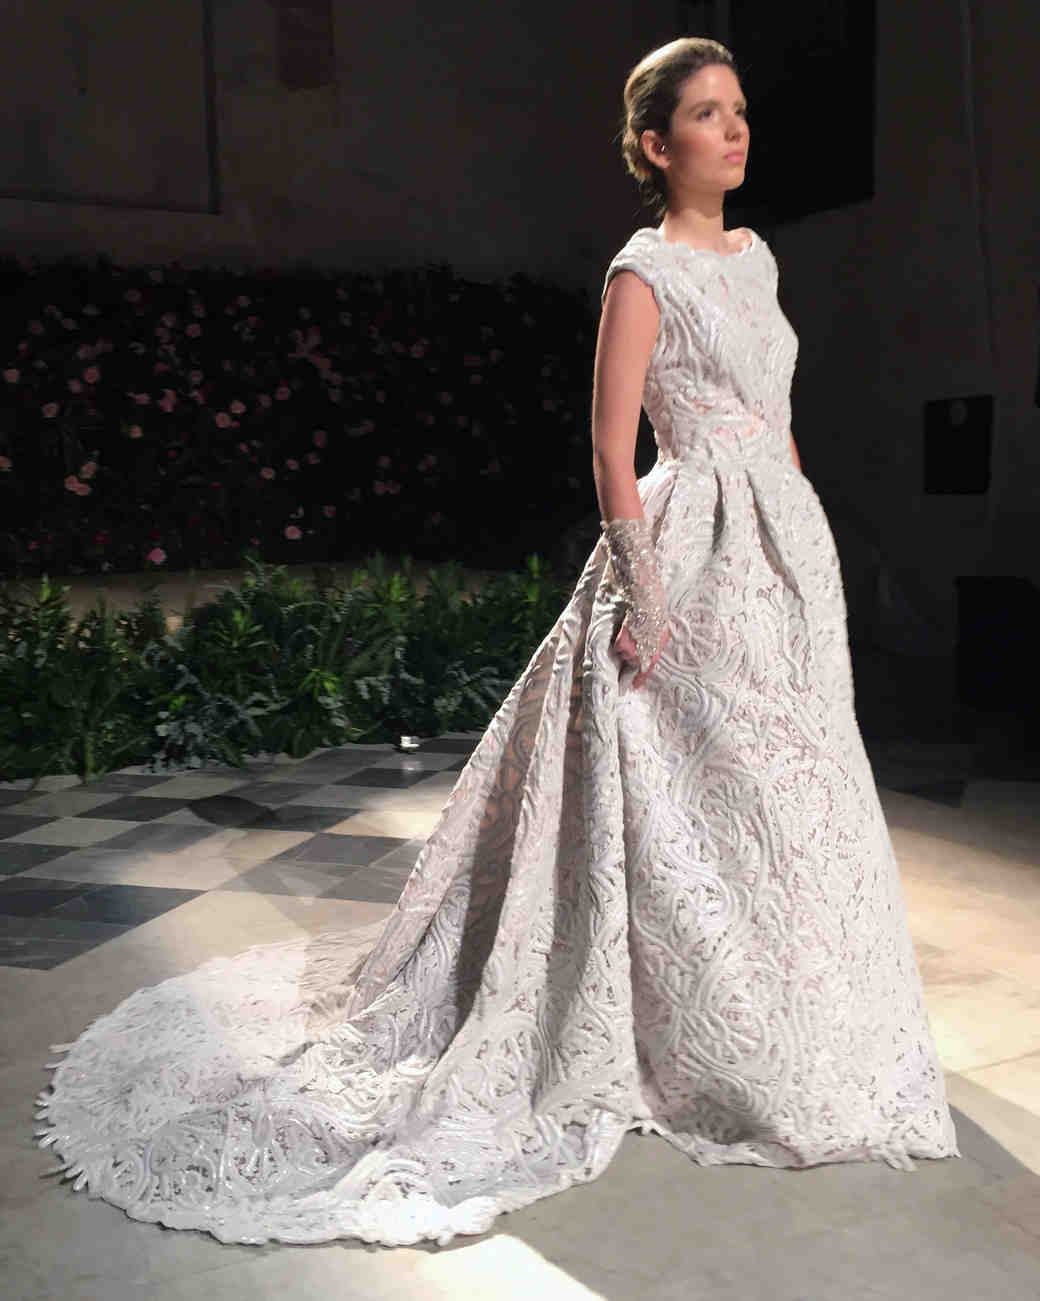 cartagena-bridal-week-tcherassi-7839-5-0915.jpg